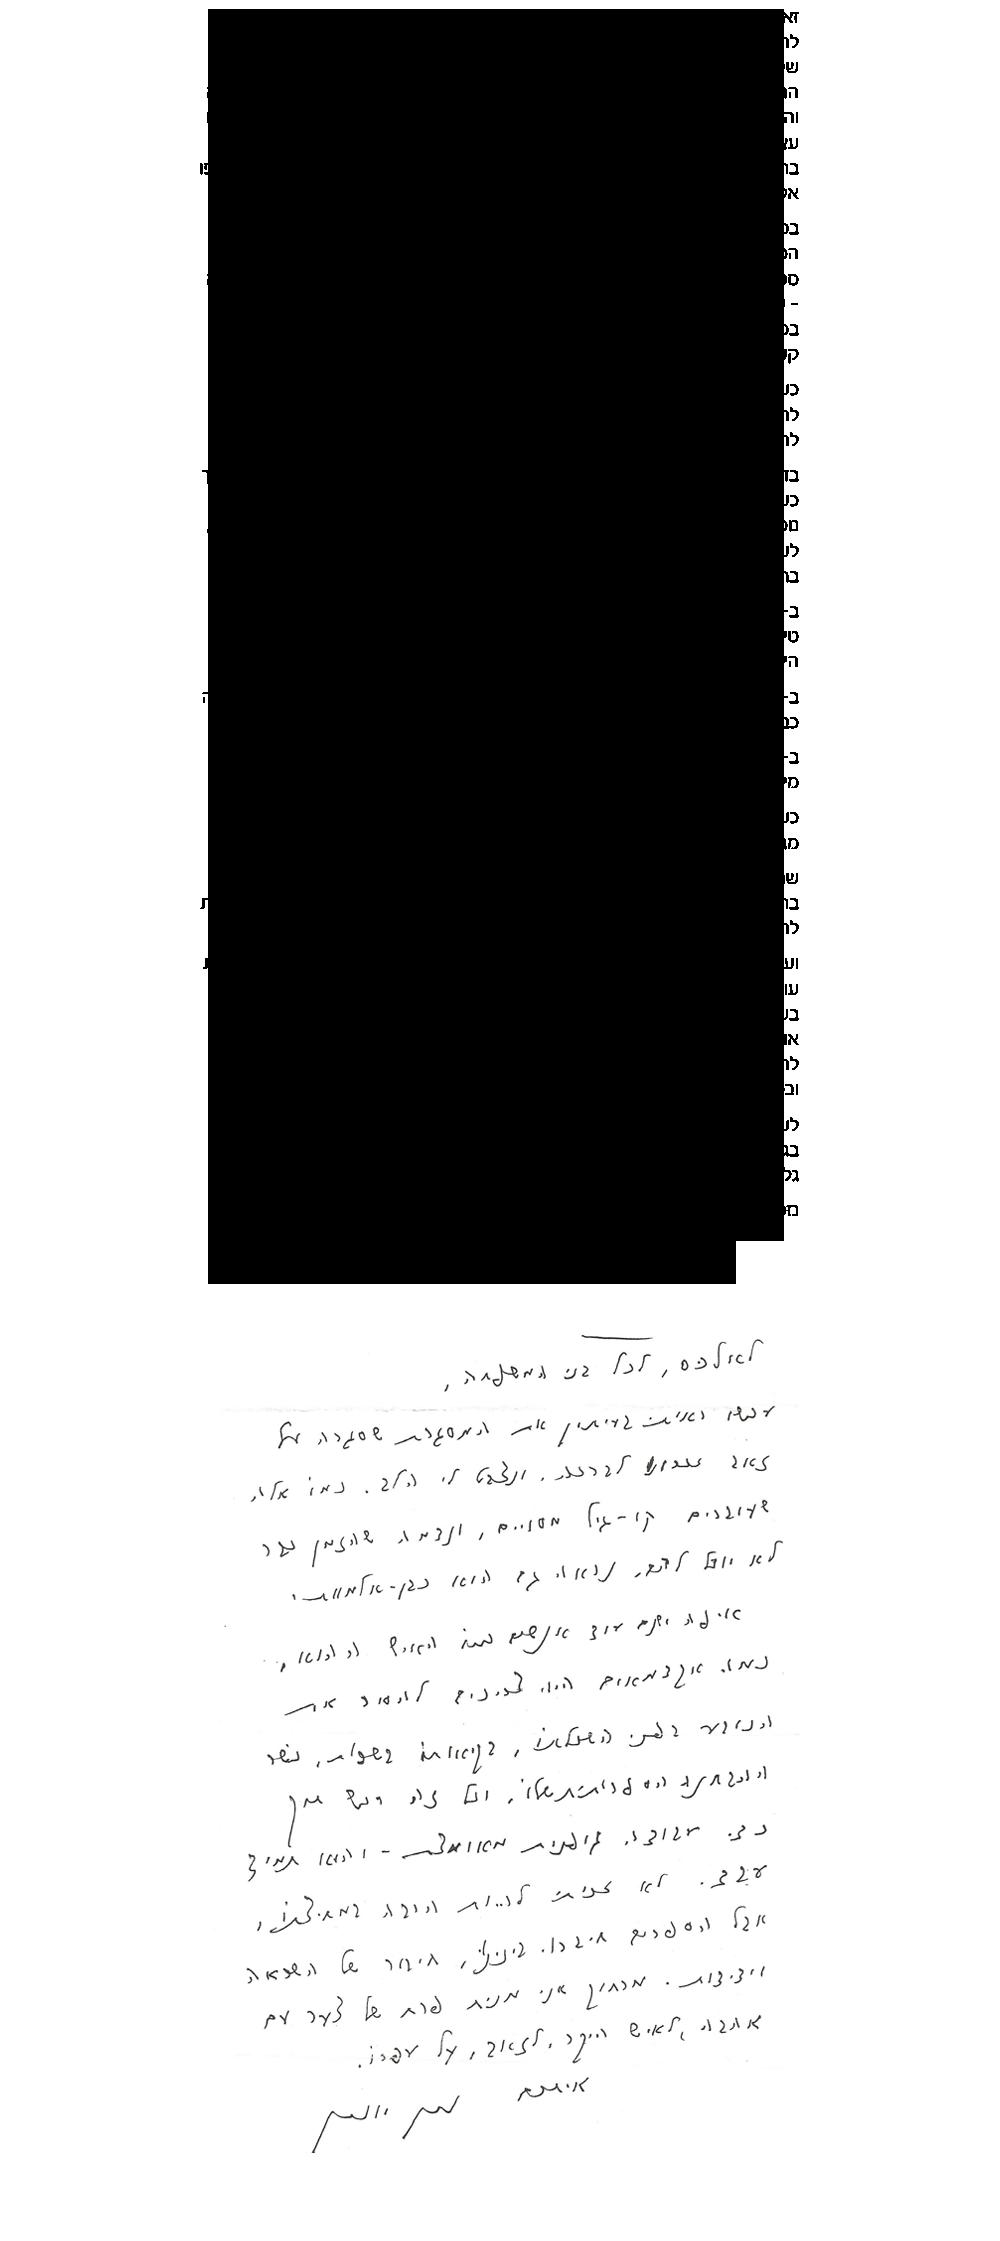 טקסט על זאב בר-אילן